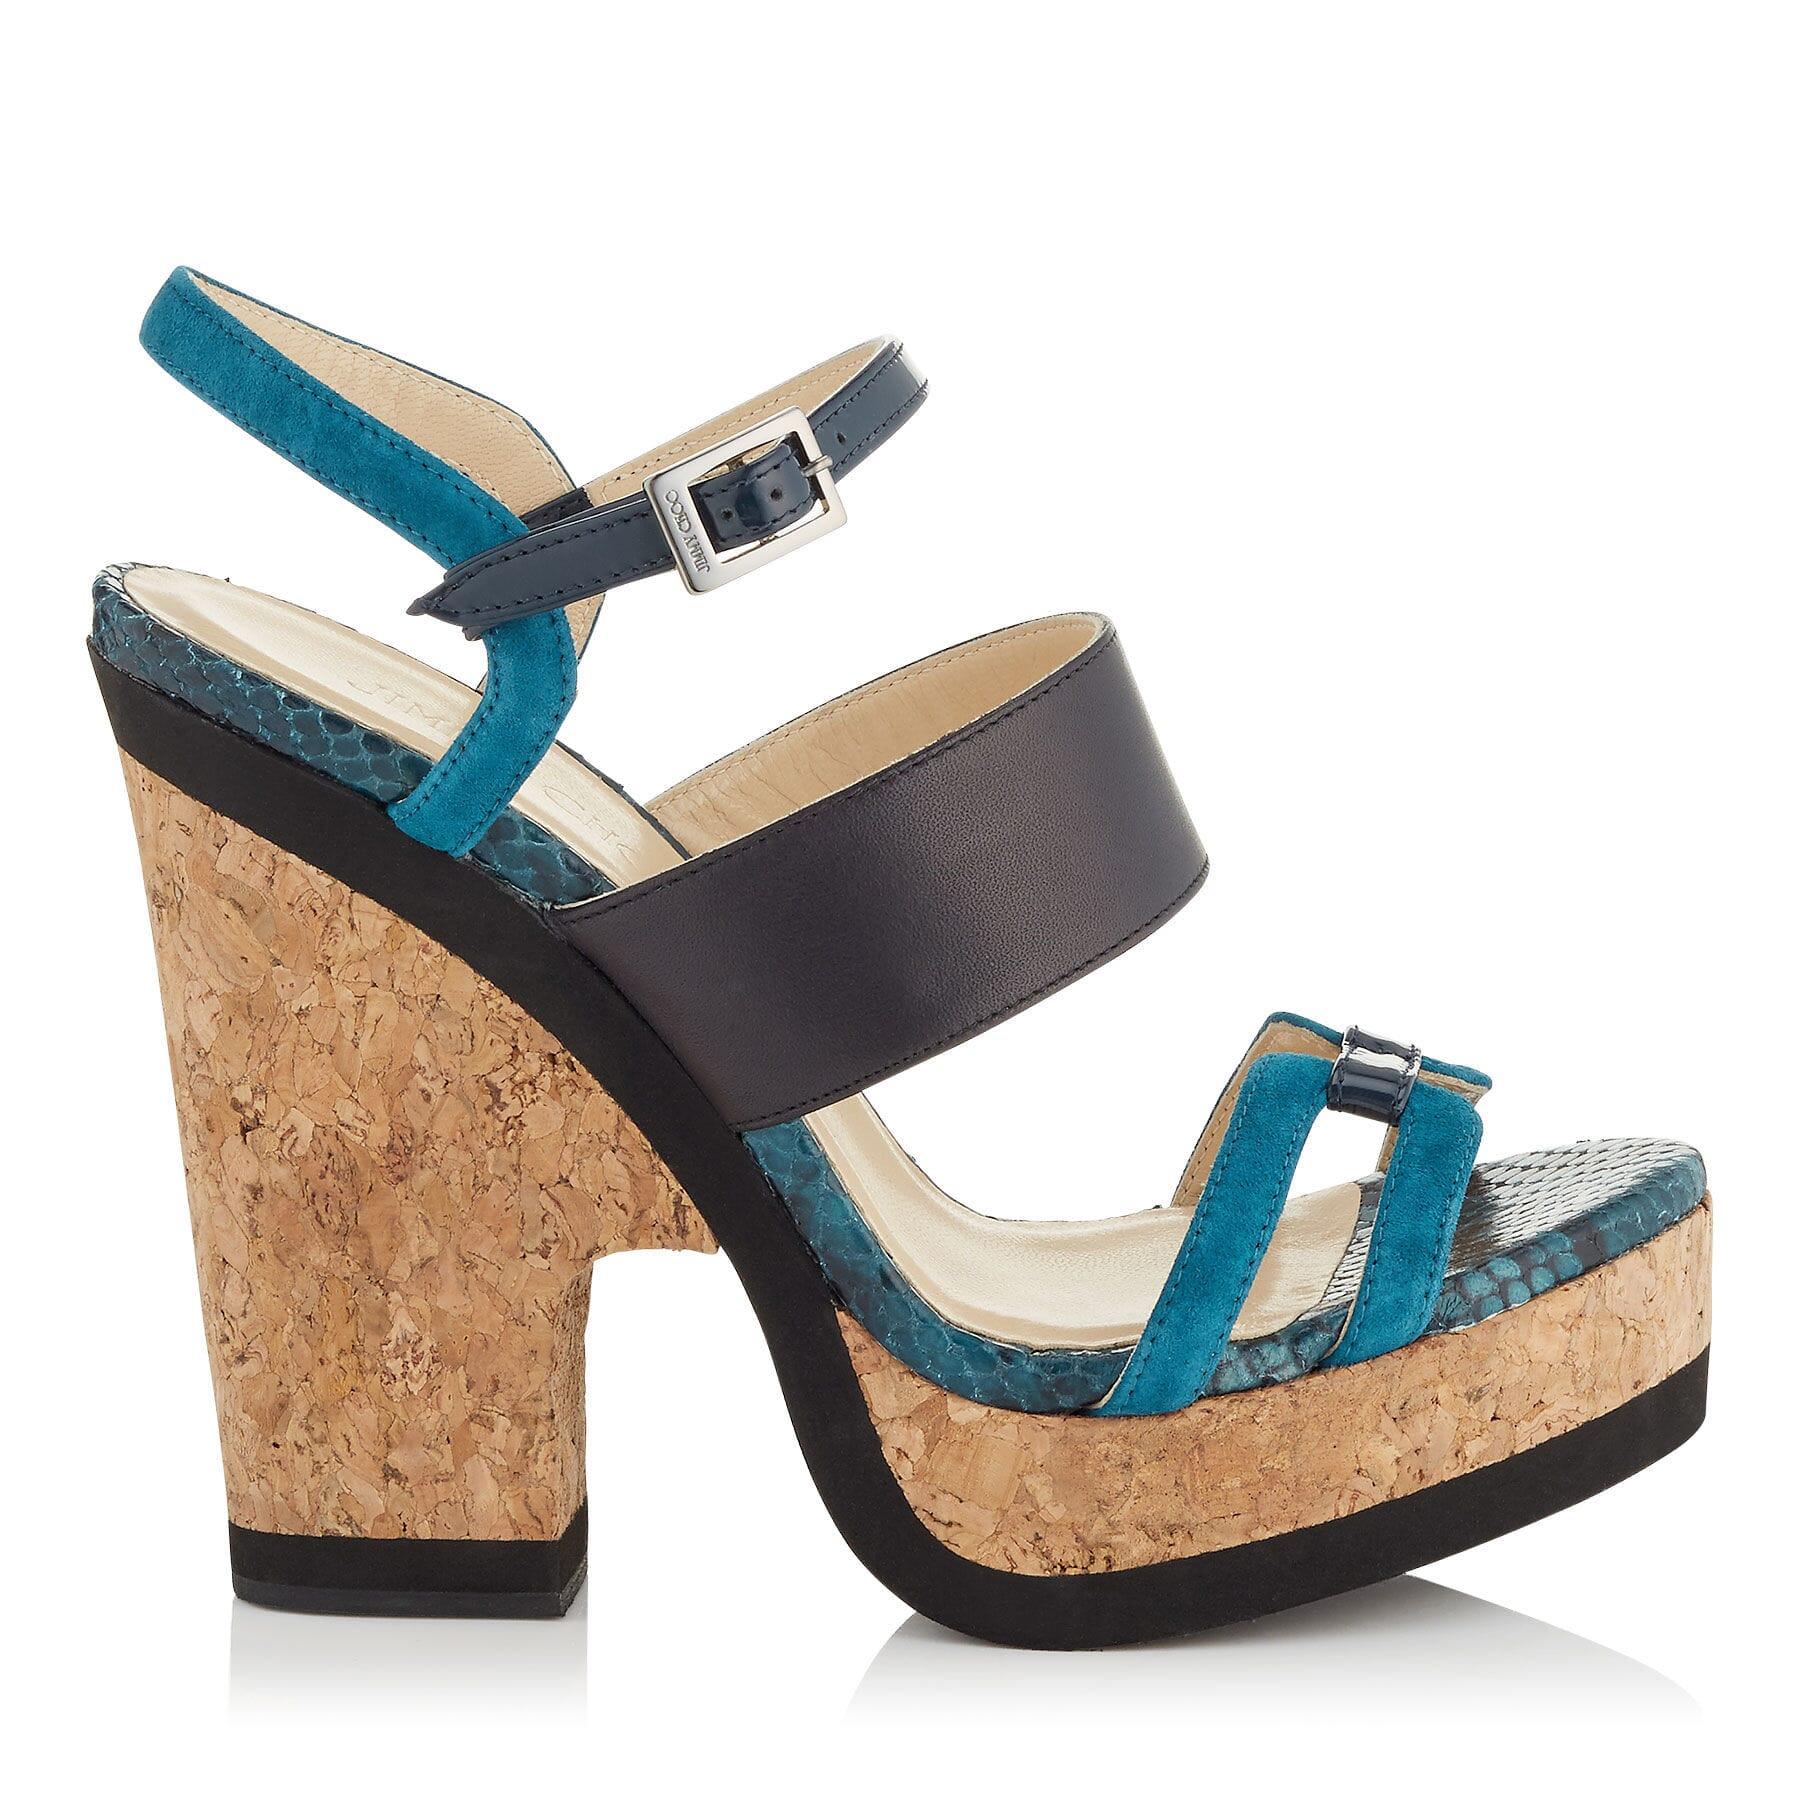 Shoes Sandals For Sale